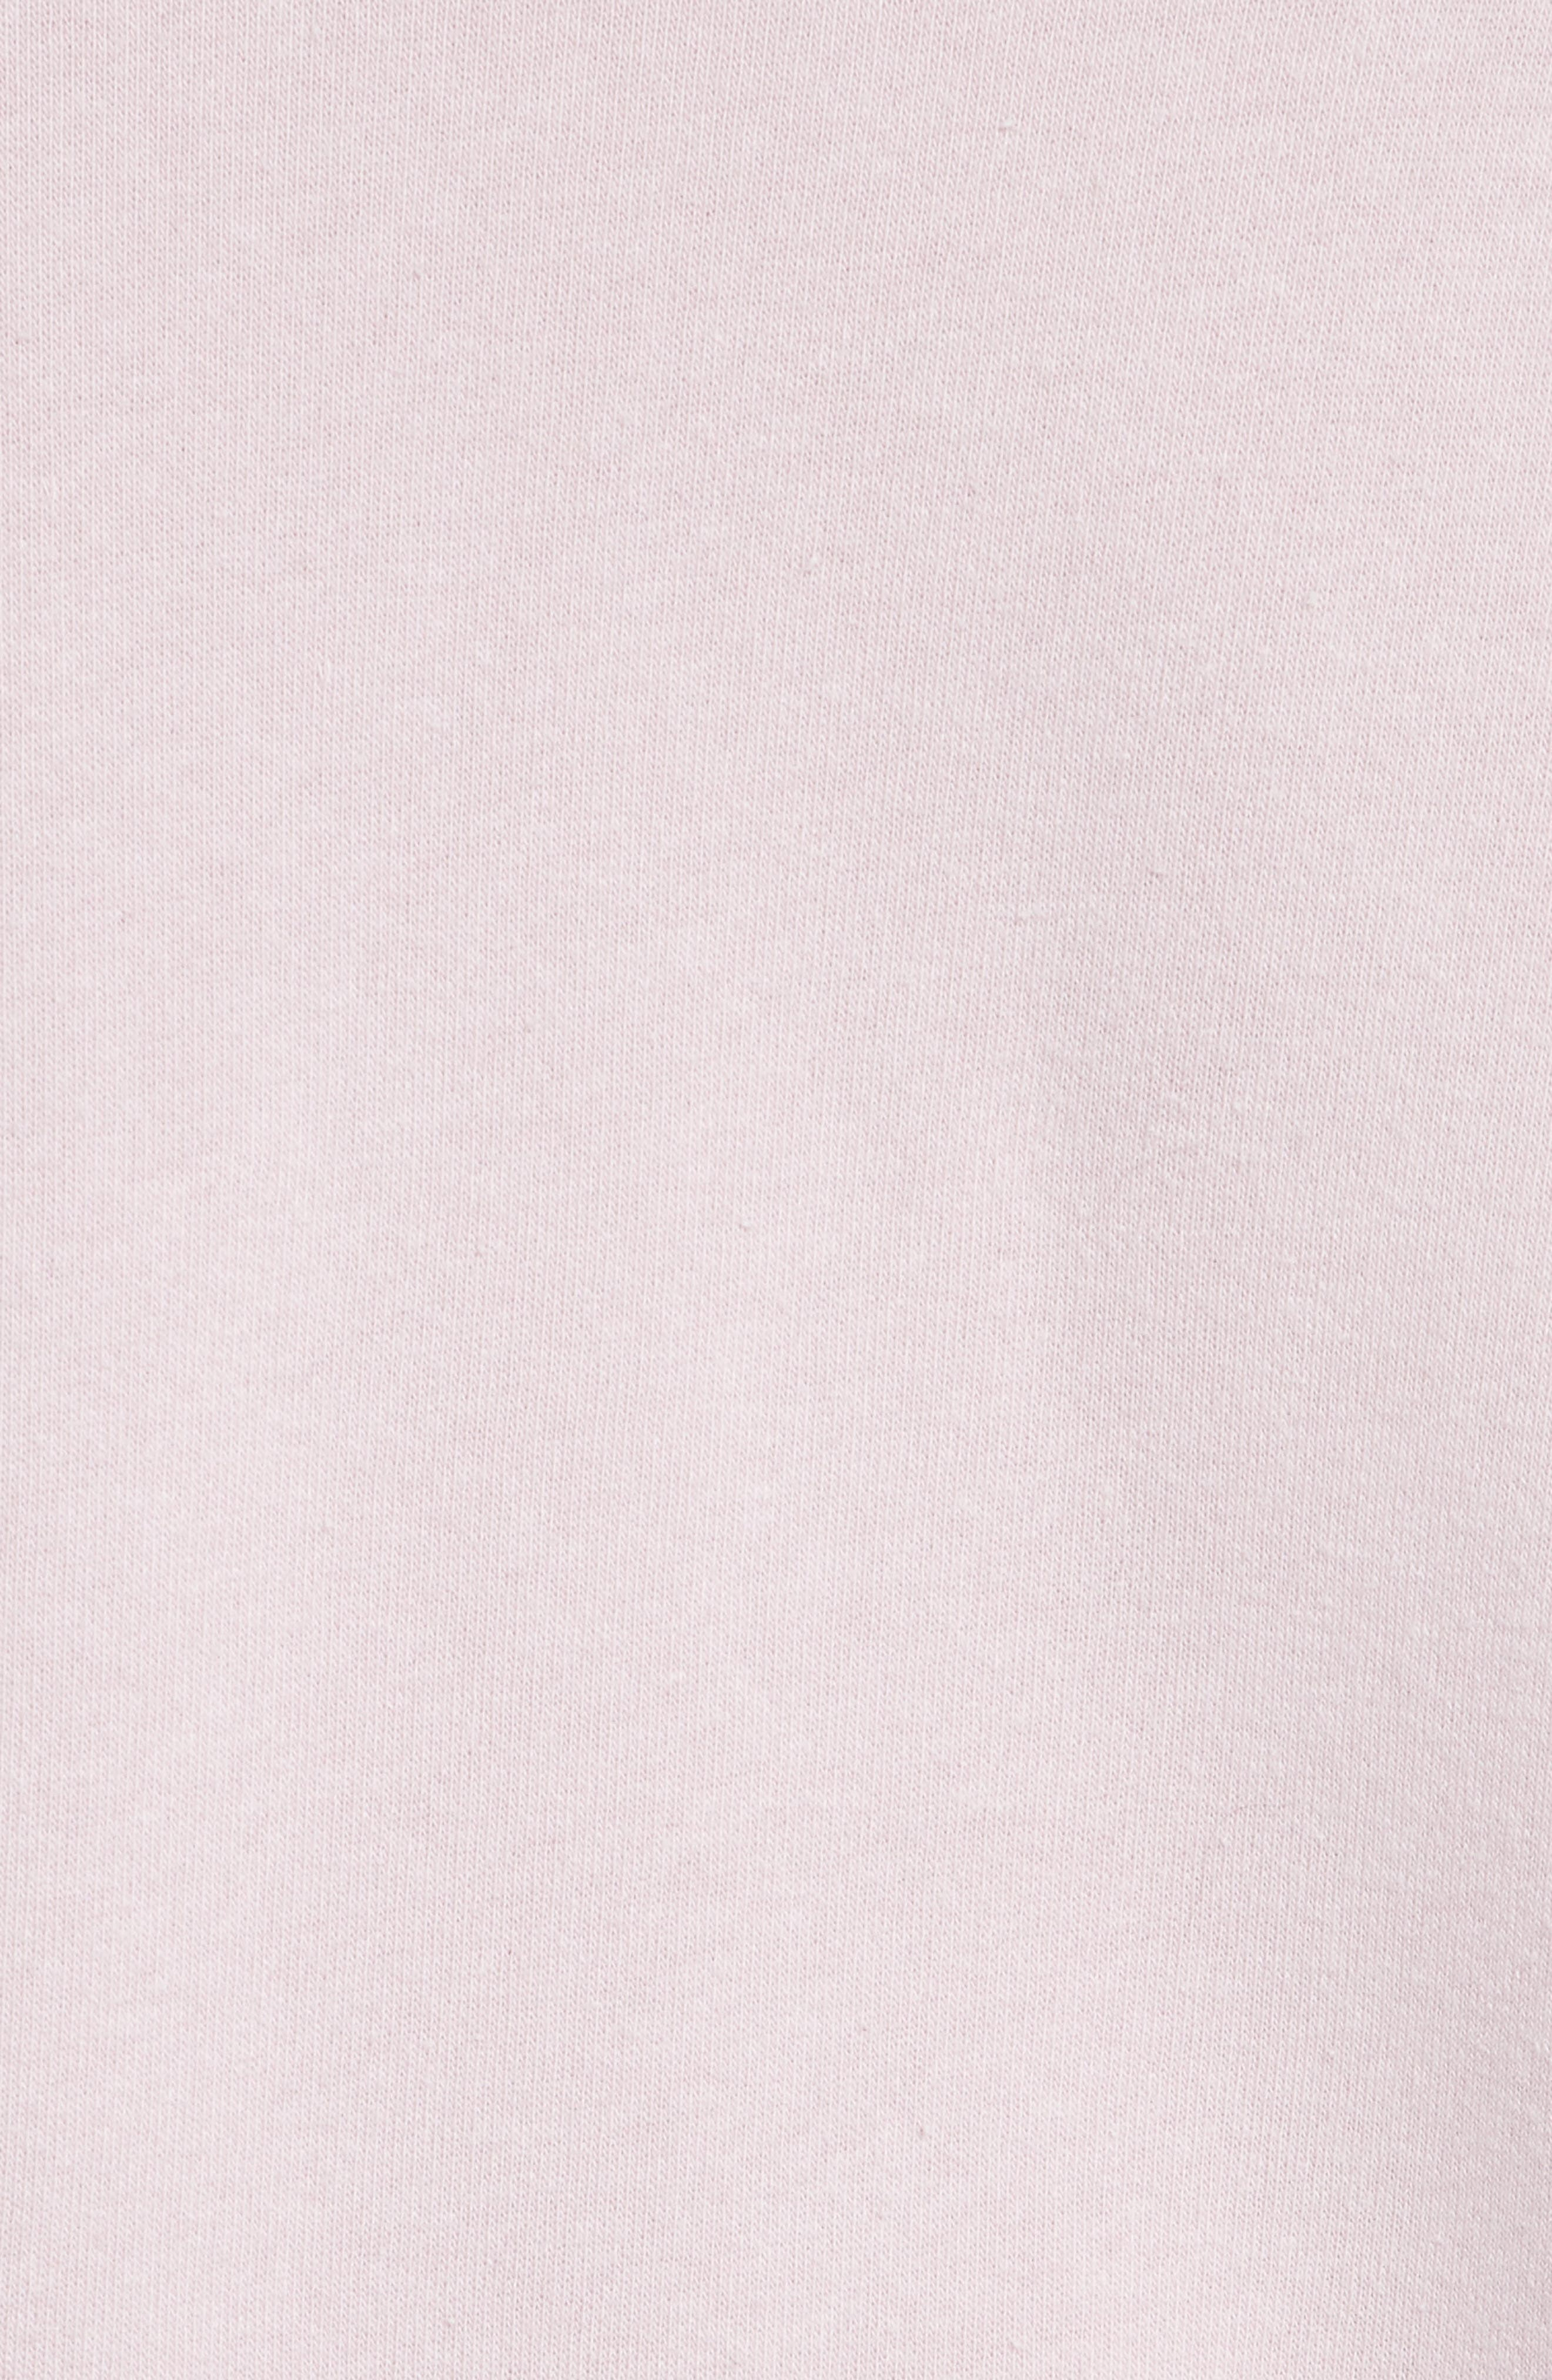 Clementine Sweatshirt,                             Alternate thumbnail 5, color,                             581